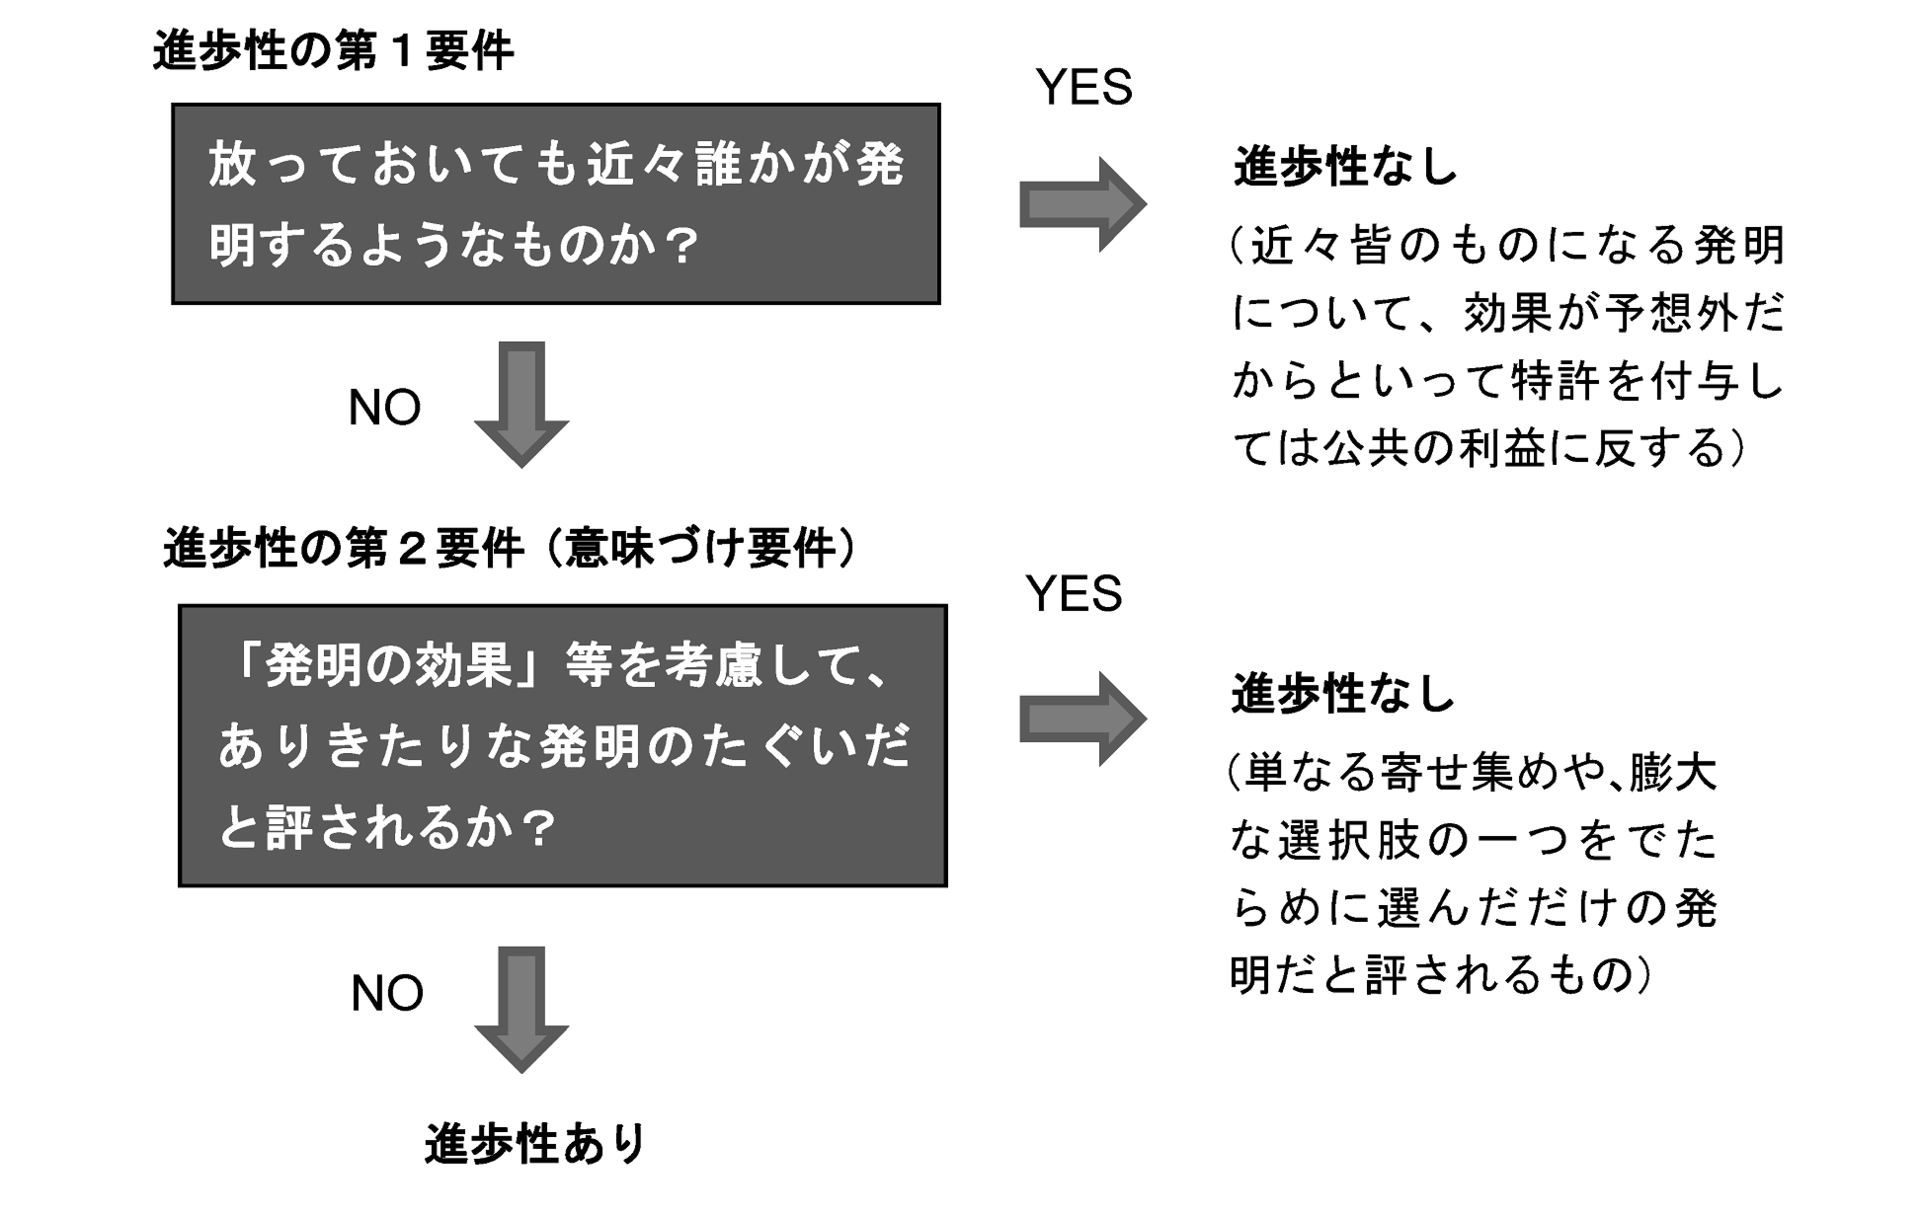 sinposei20190827-1.png